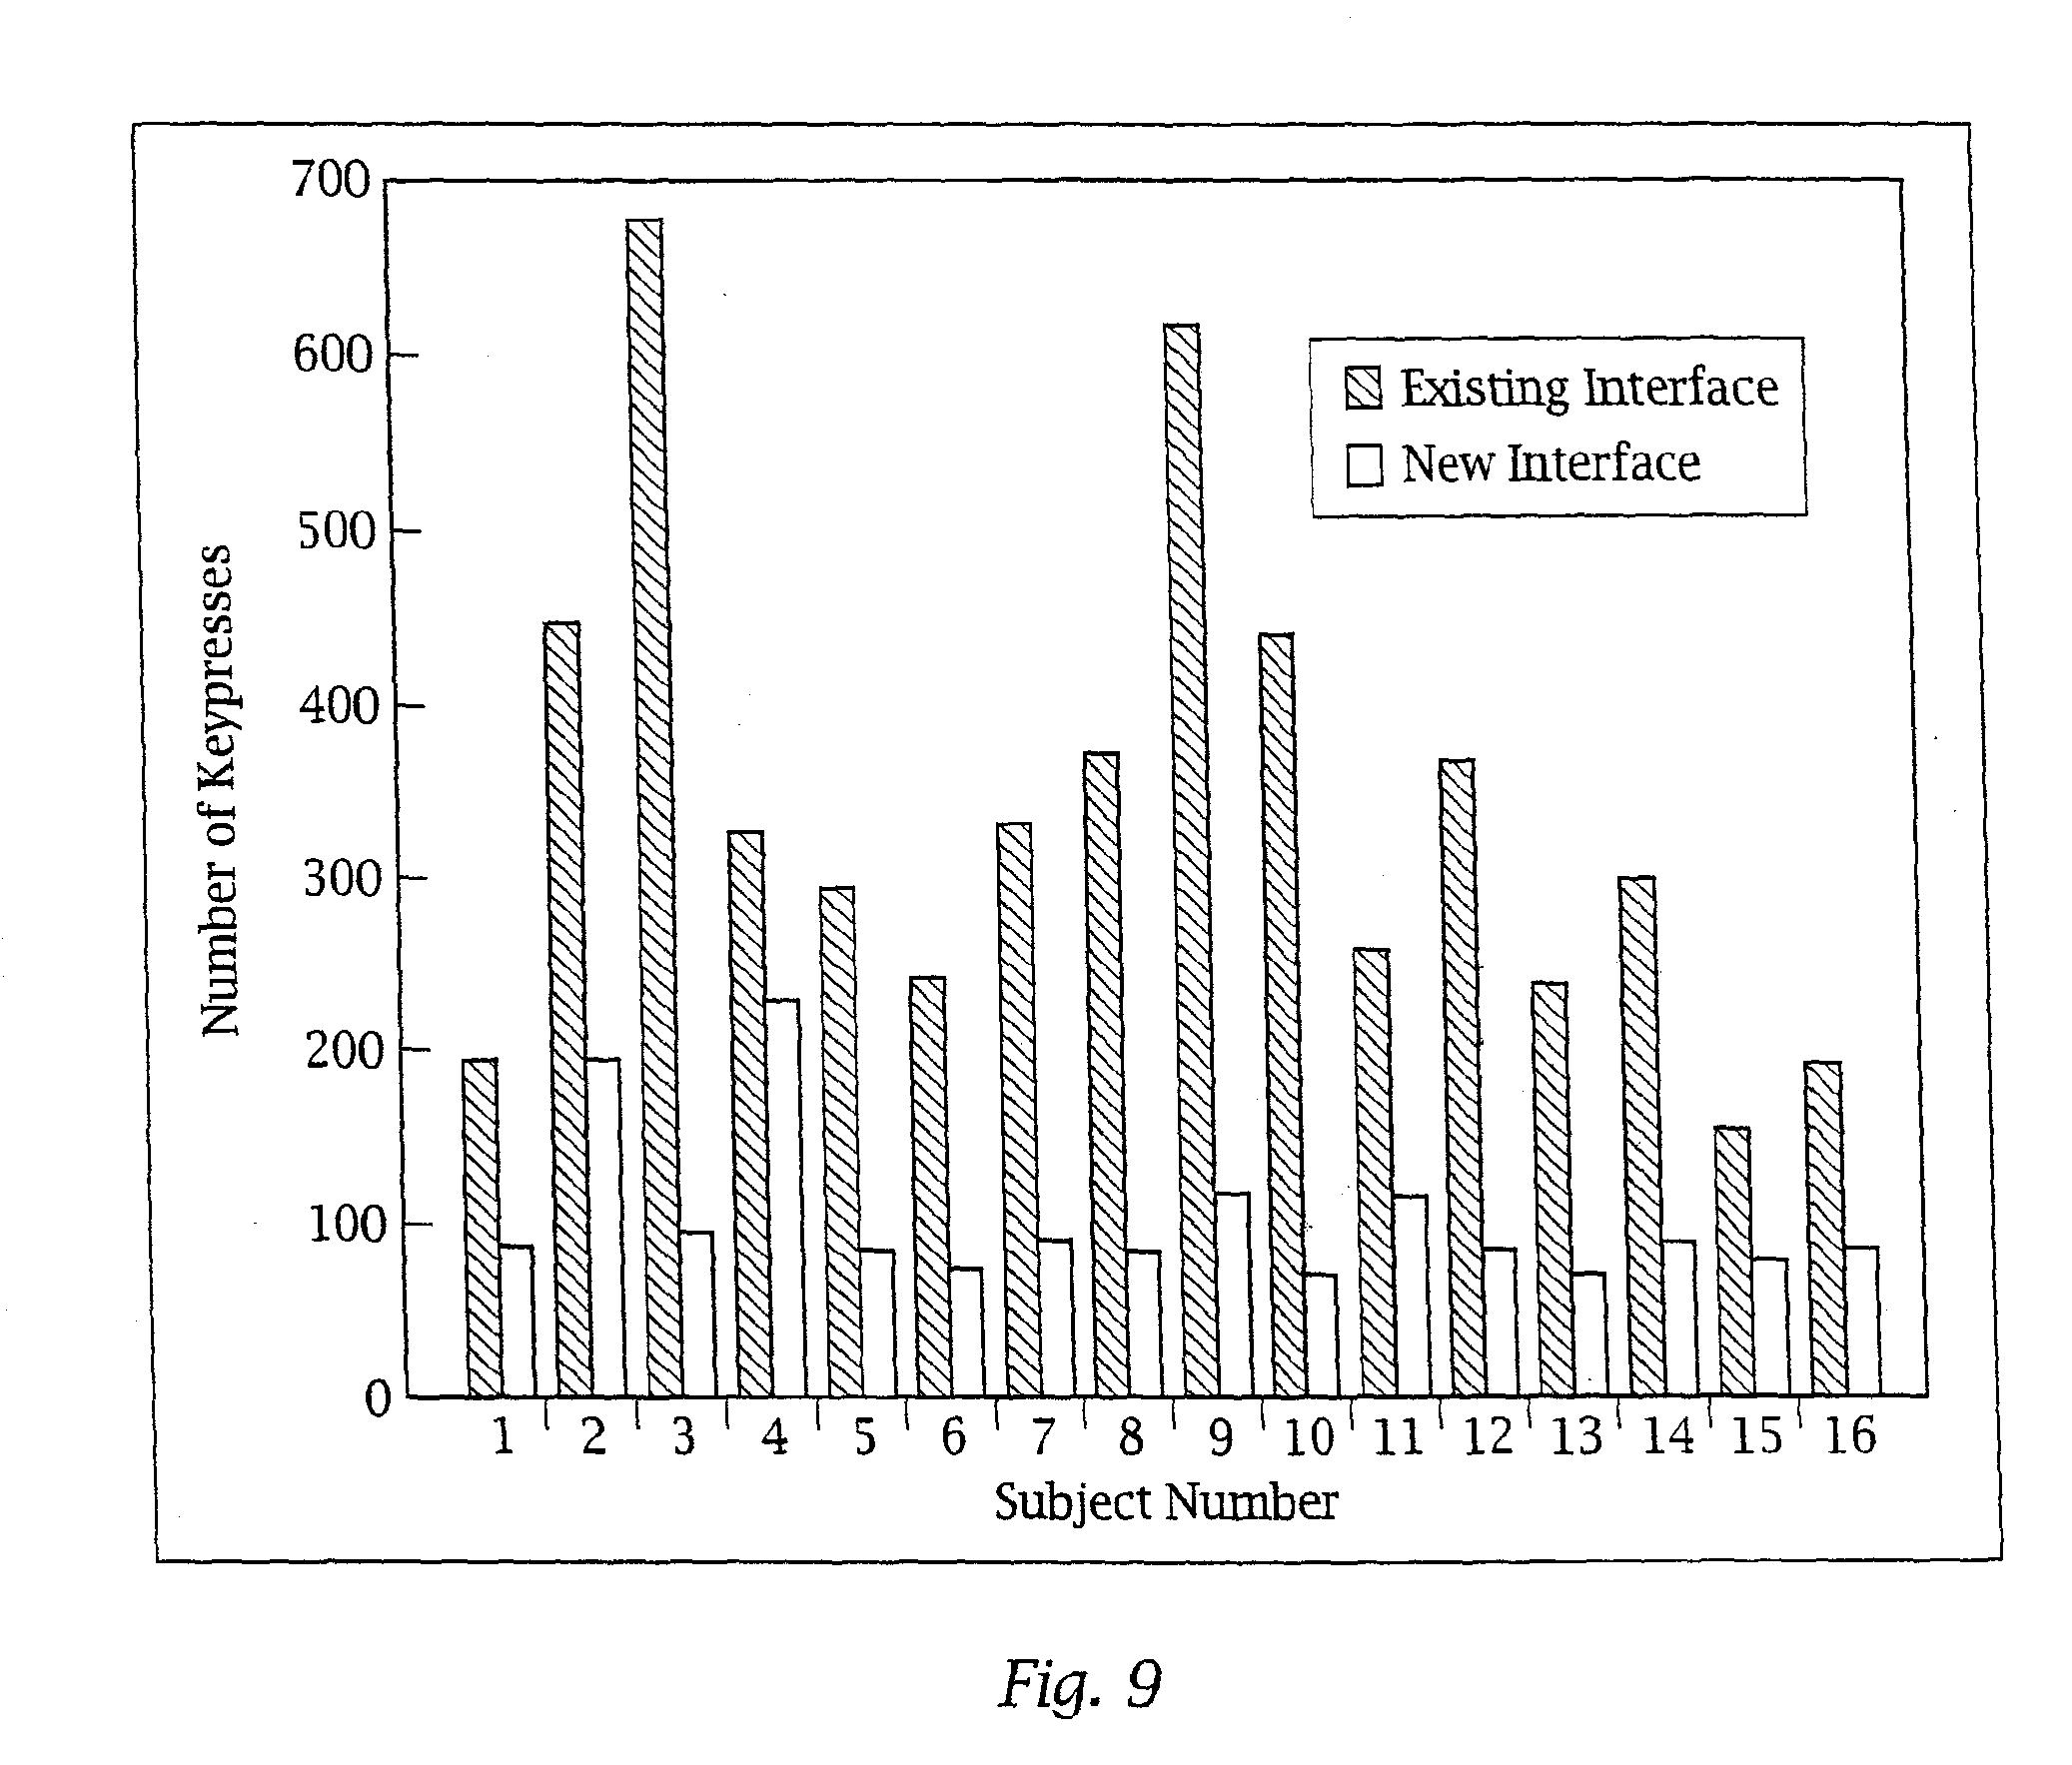 Patent US 8,583,263 B2